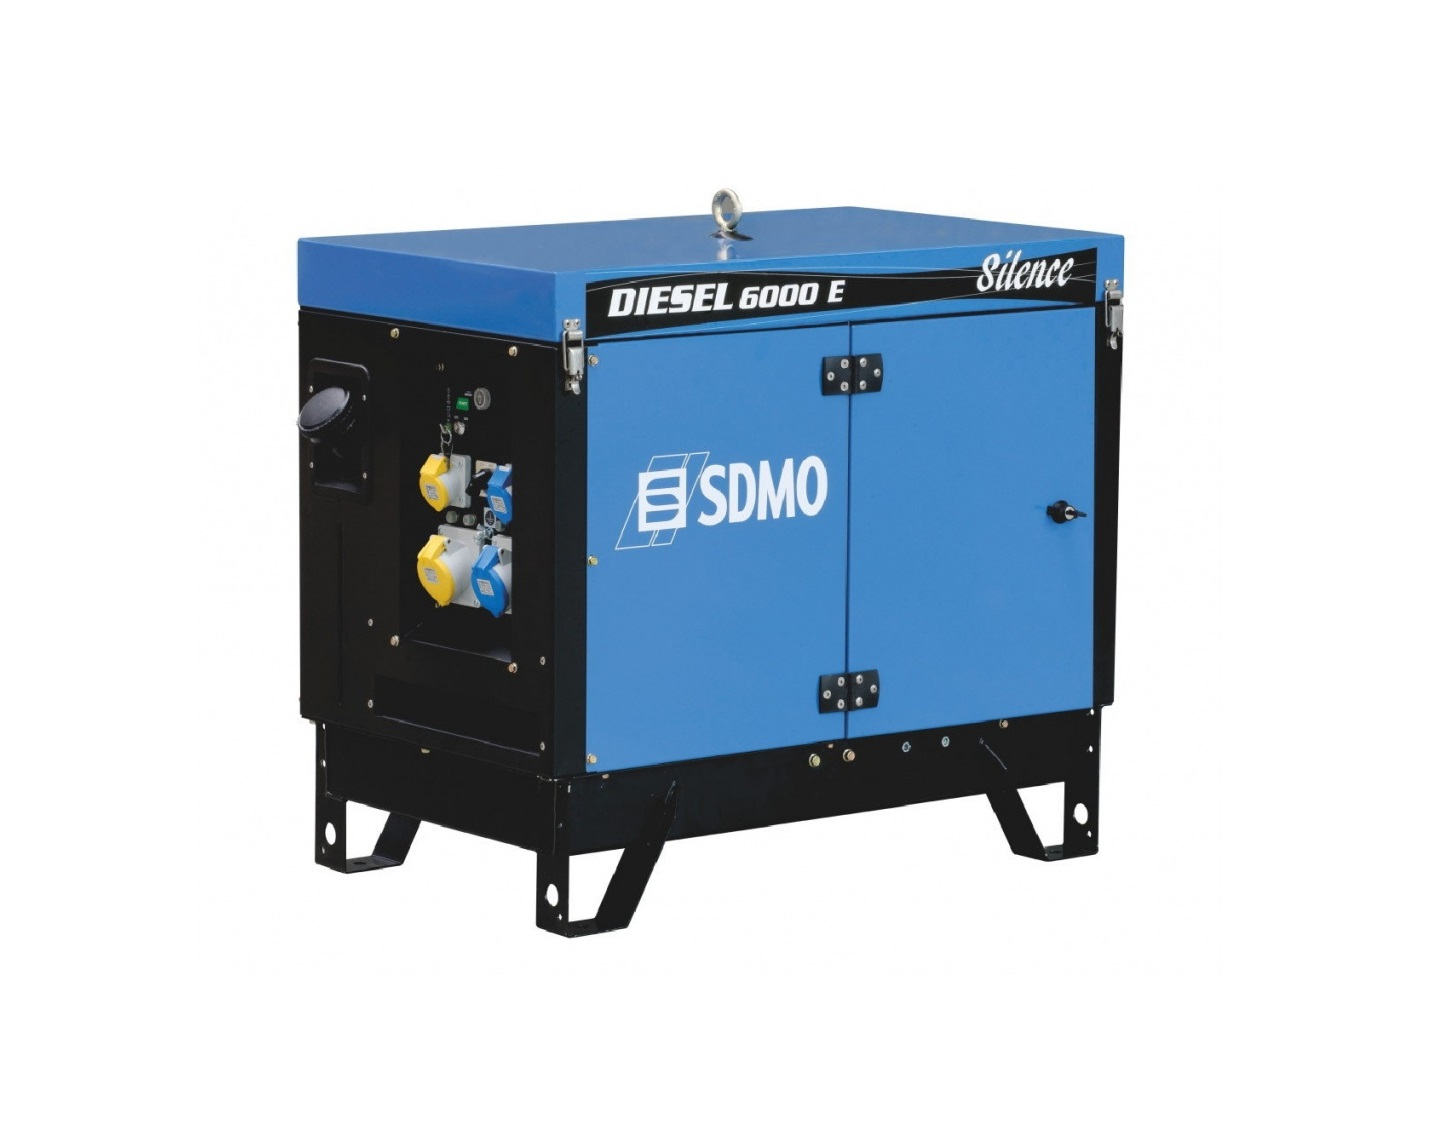 Дизельный генератор (электростанция) SDMO DIESEL 6000 E AVR SILENCE